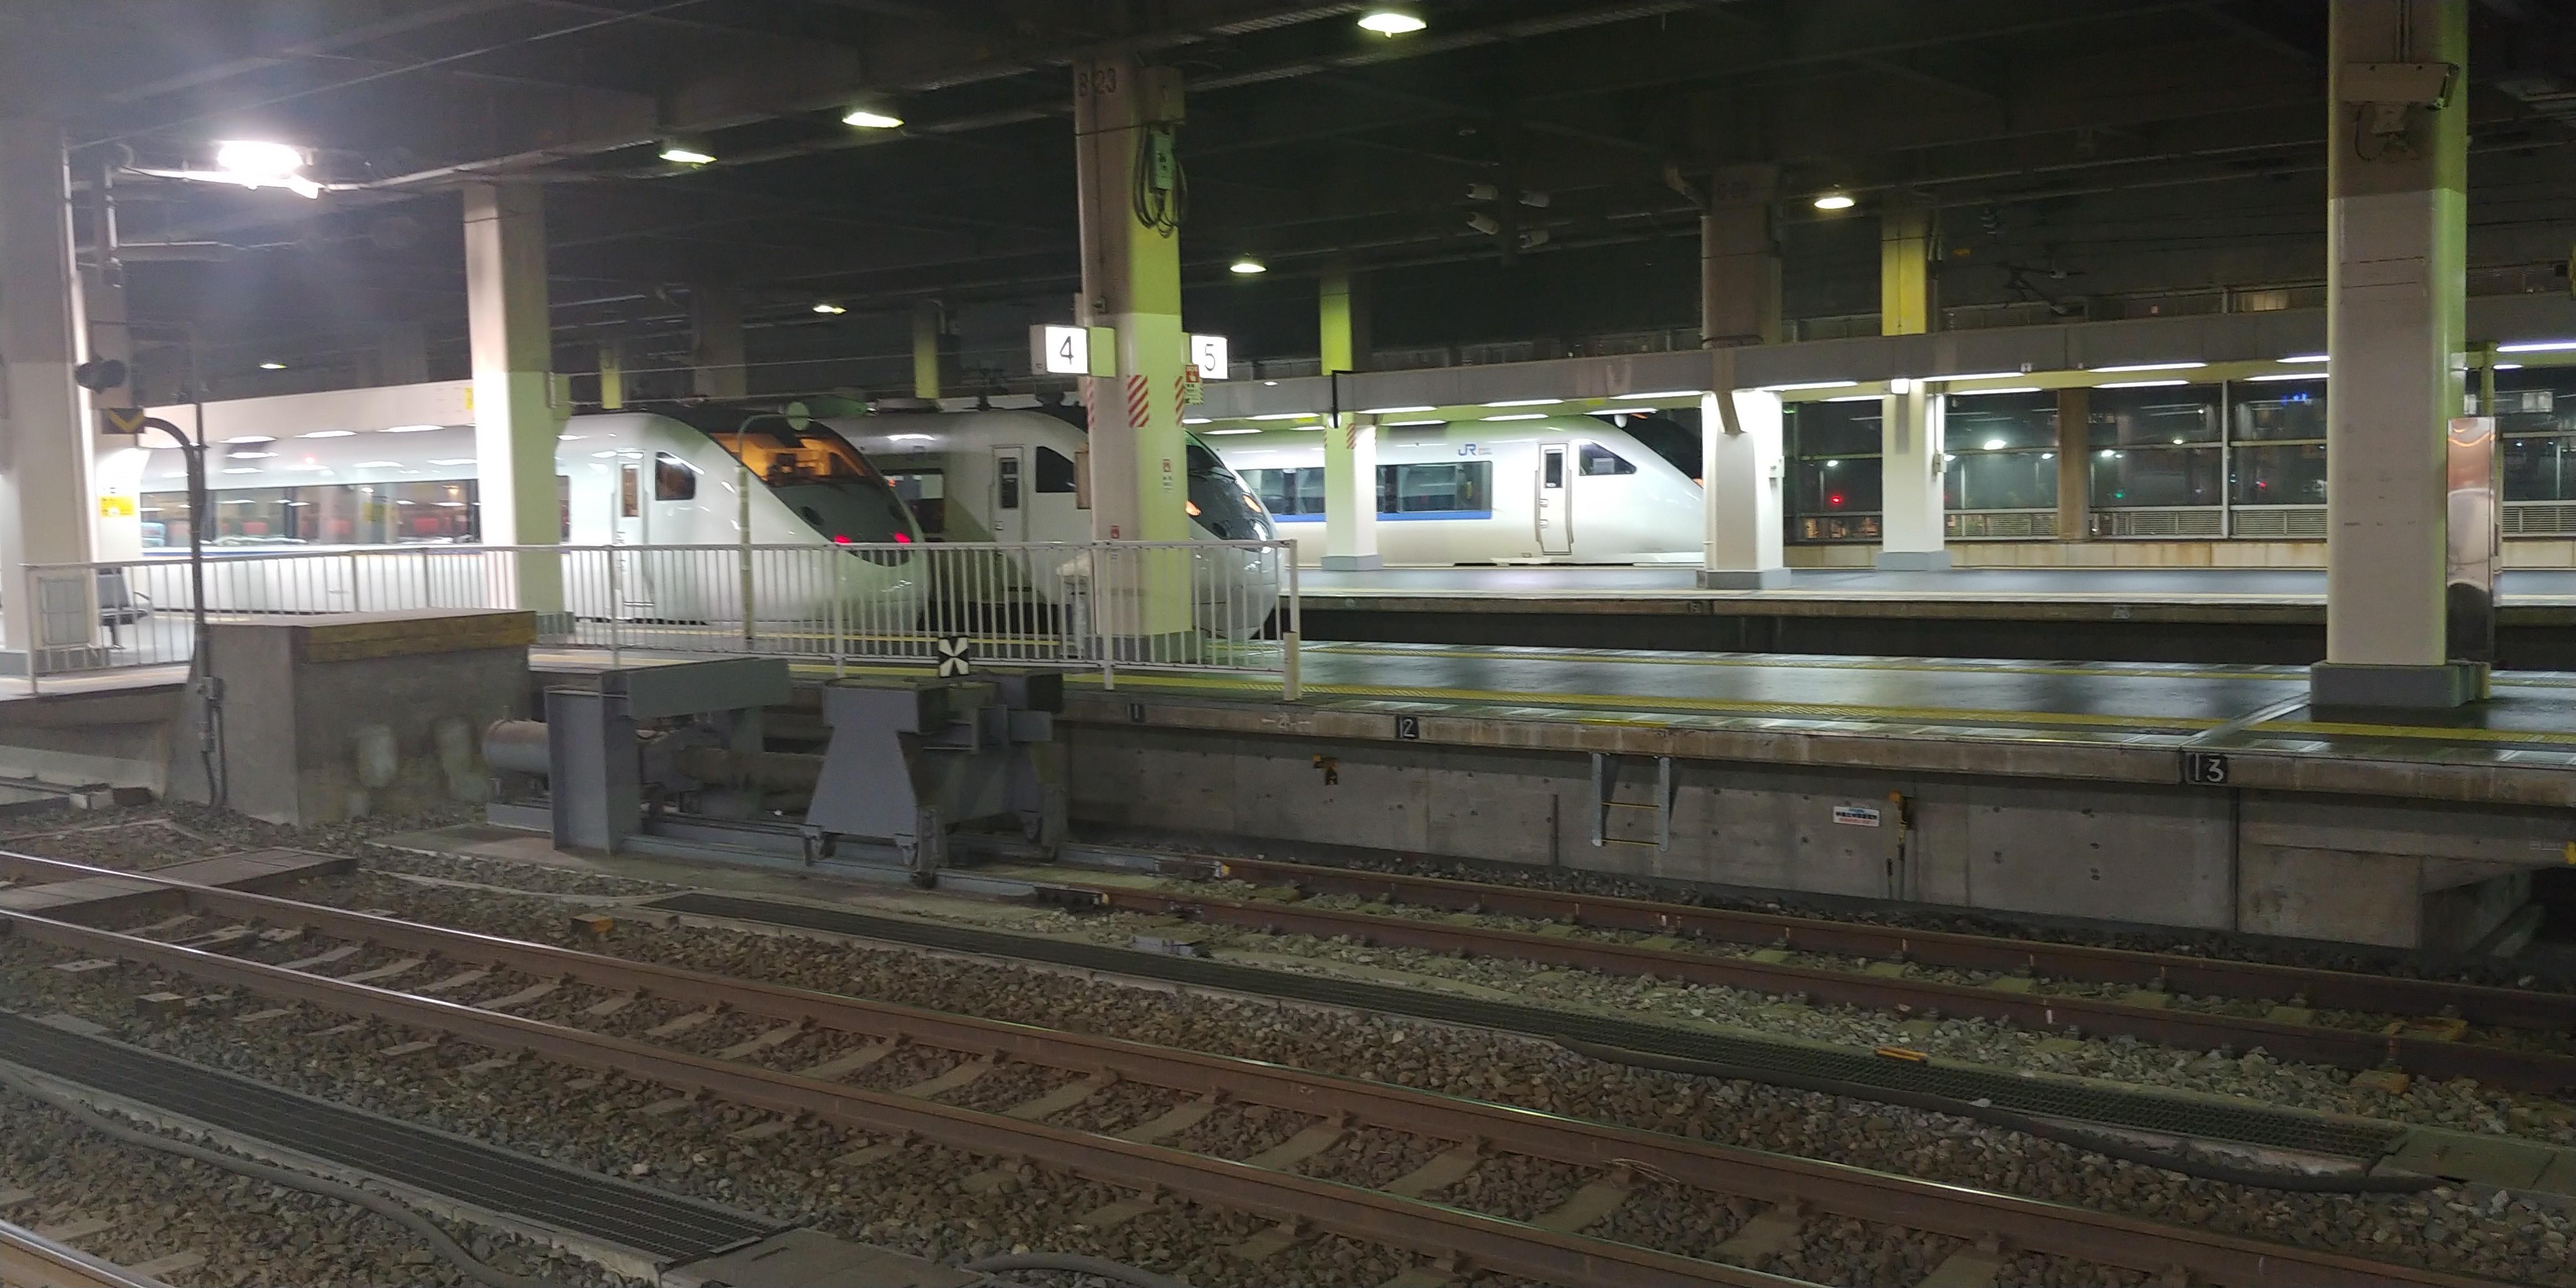 f:id:kishuji-kaisoku:20191218012545j:image